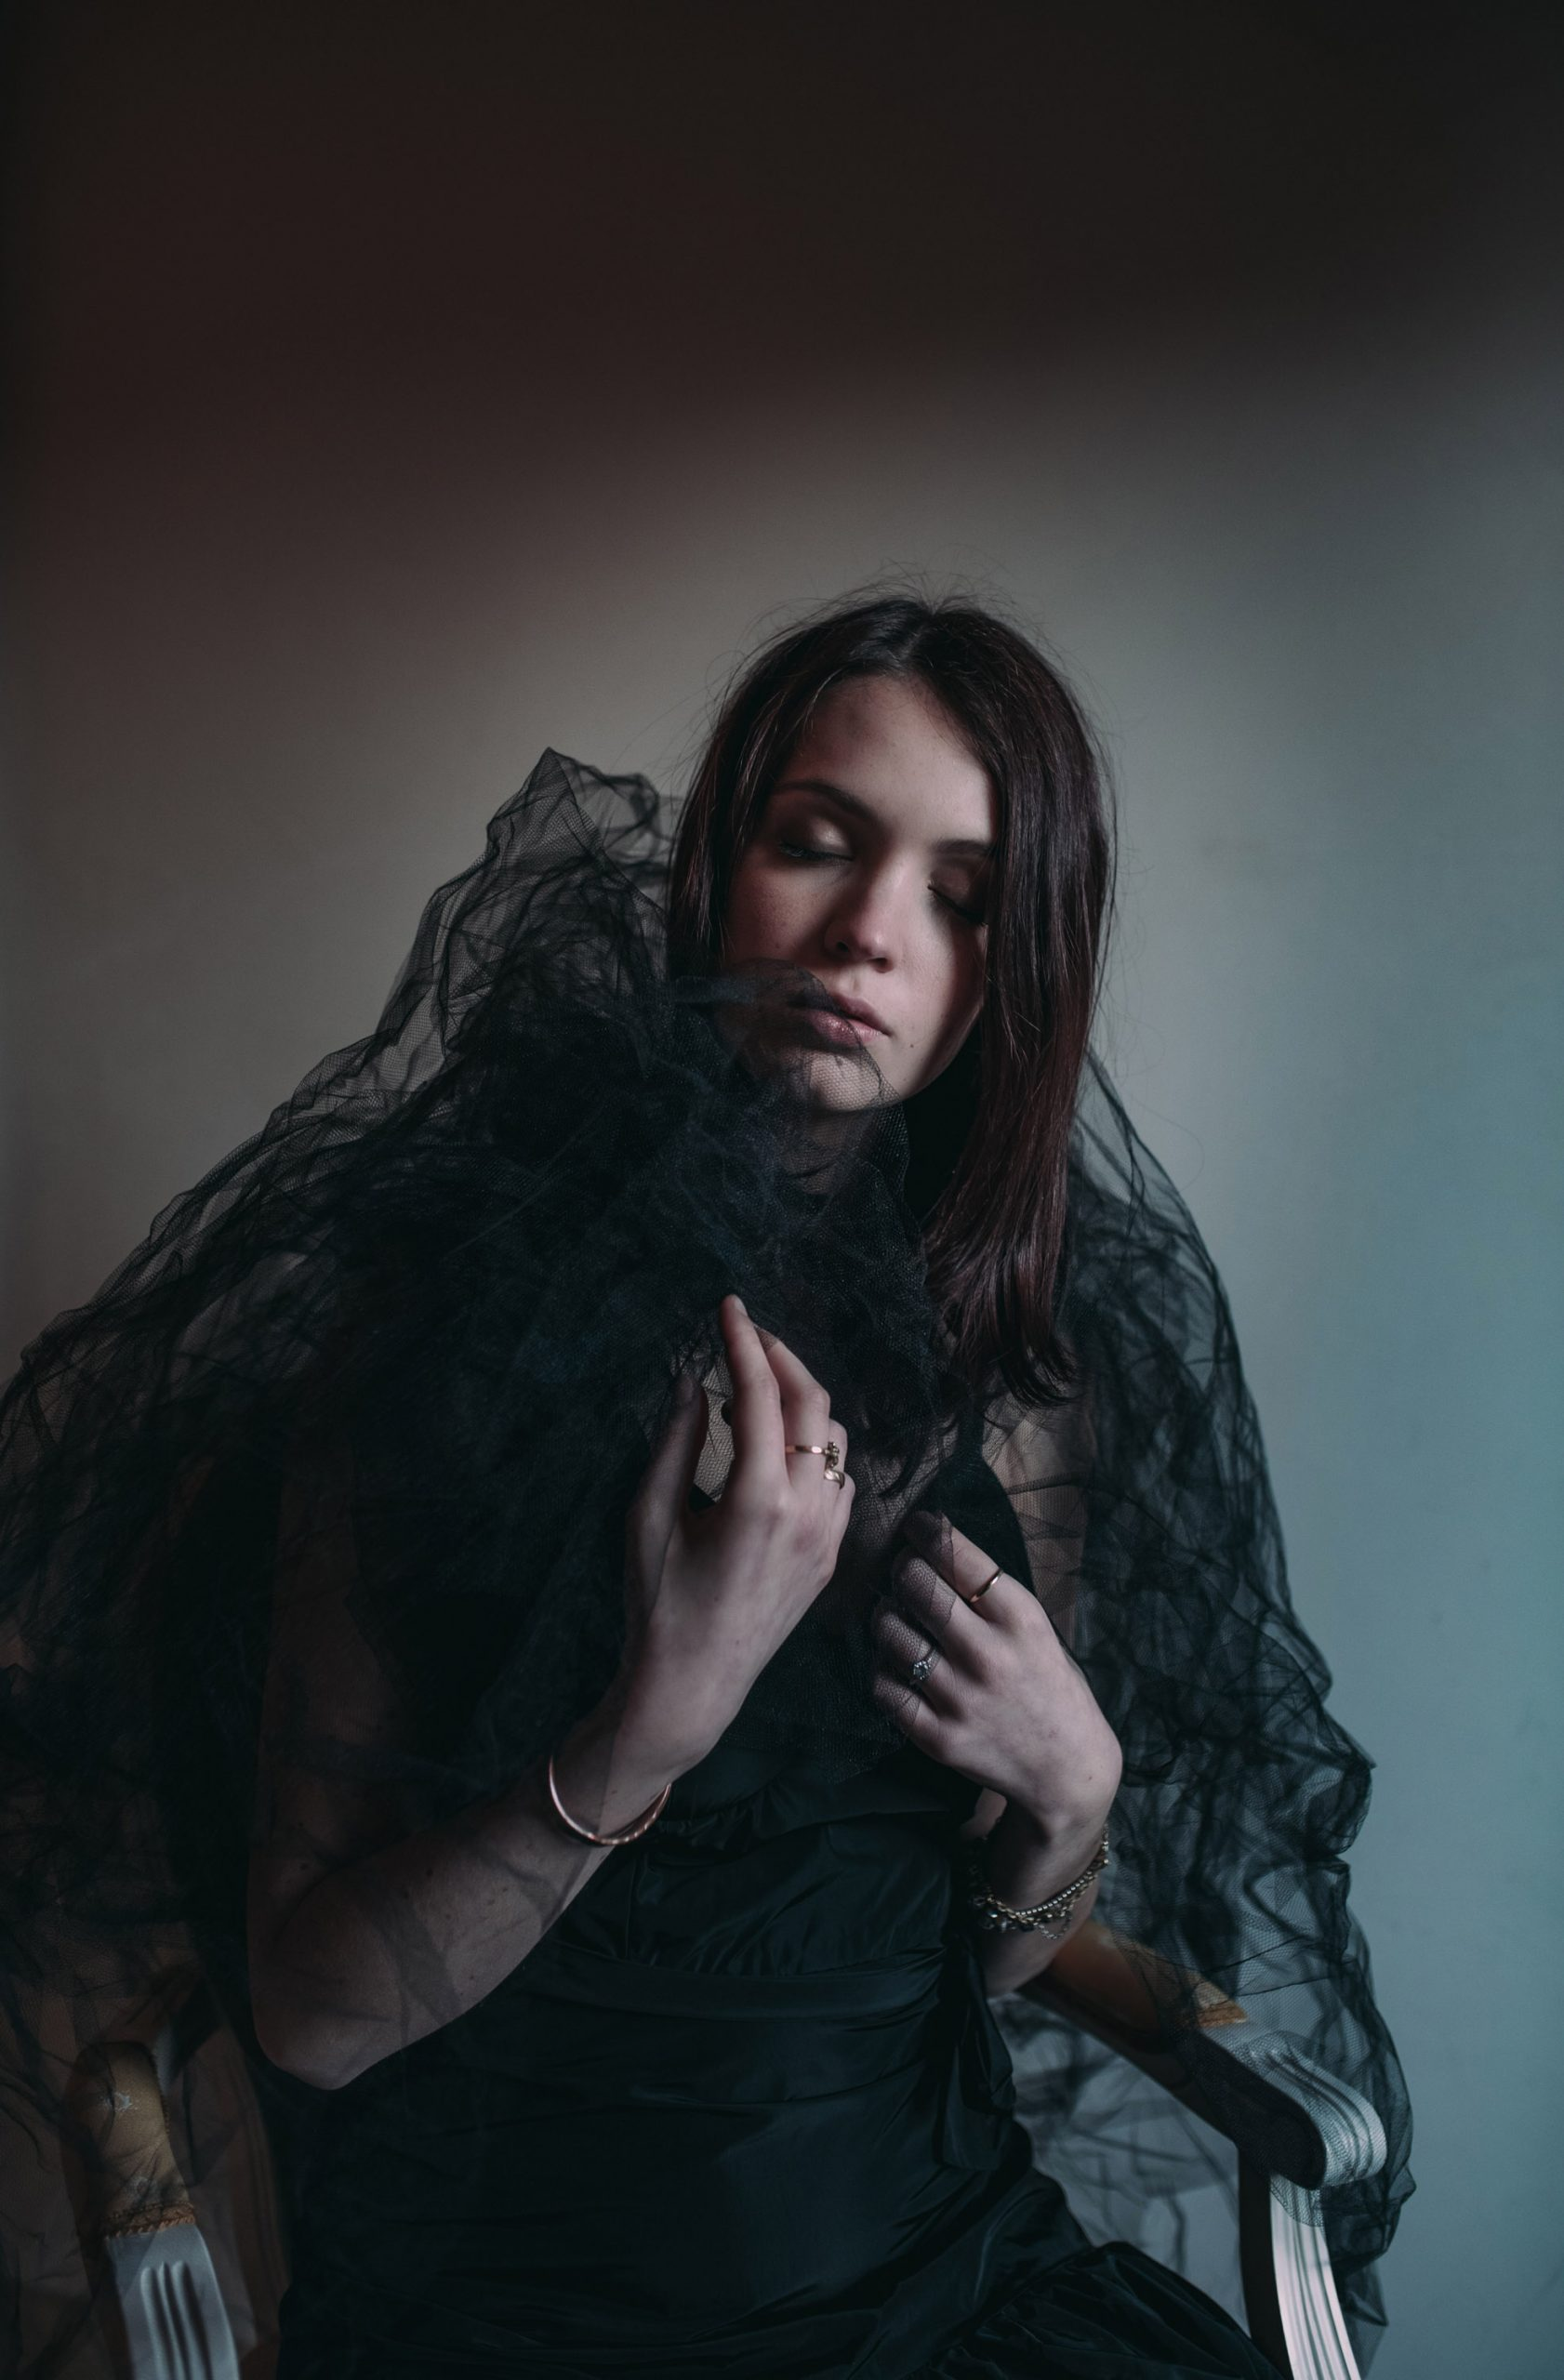 Categorie: Fashion, Fine Art, Portrait; Photographer: STEFANIA RIGO; Model: ALESSIA CAZZADOR; Location: Noale, VE